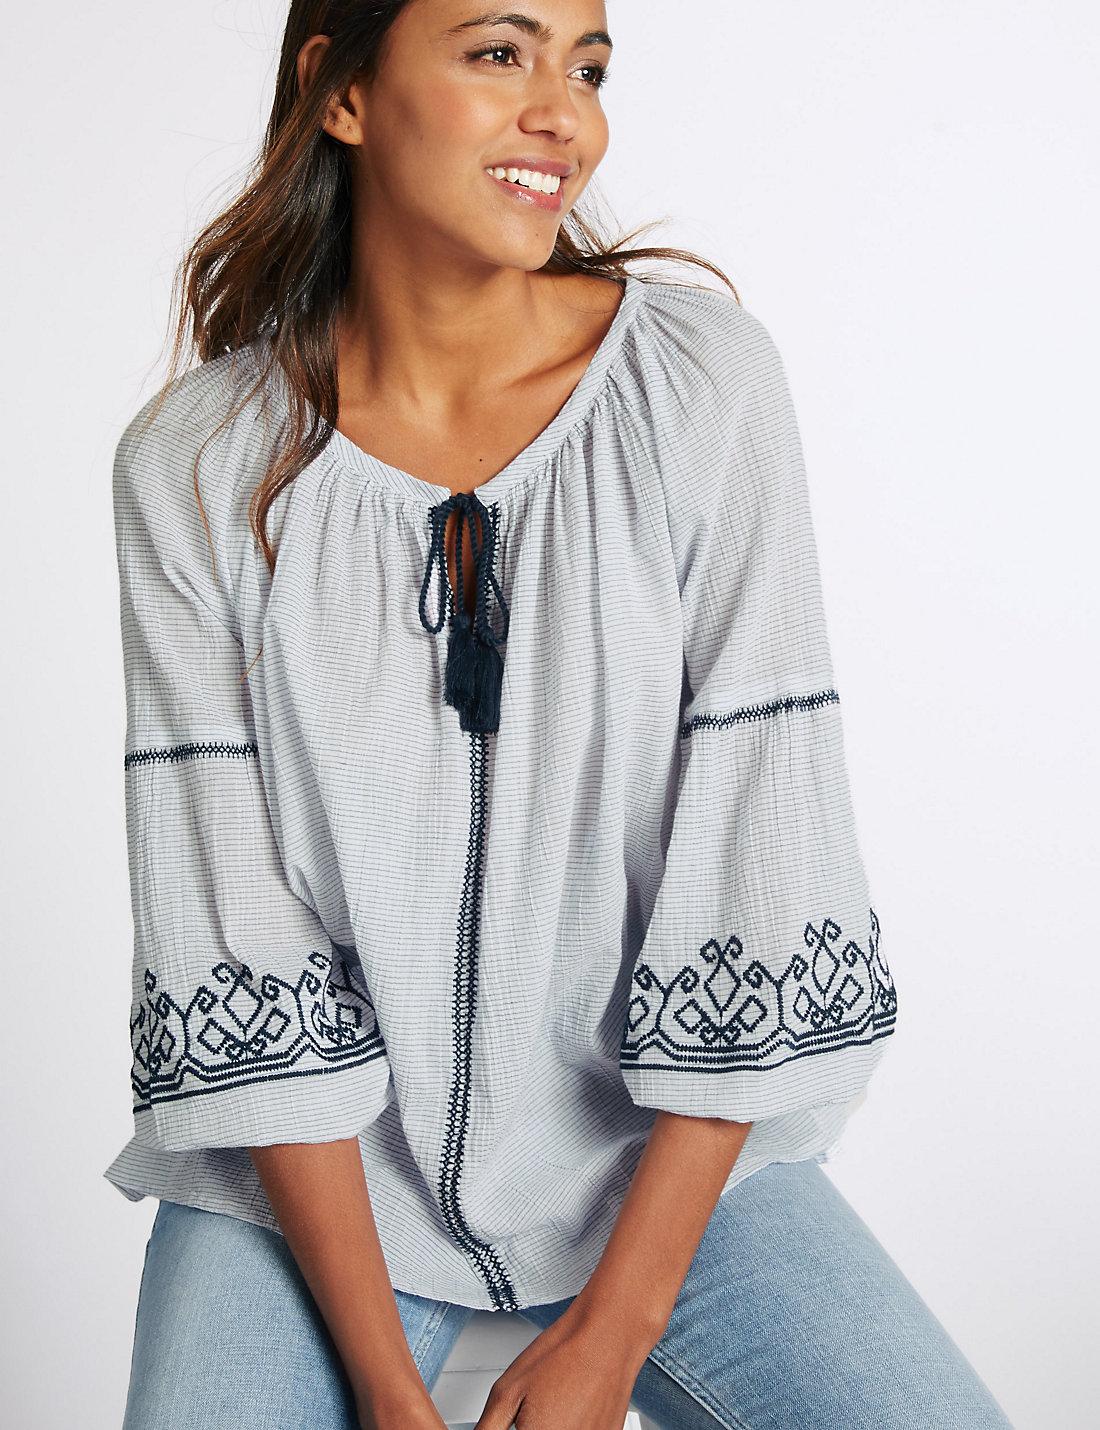 M&S folk blouse